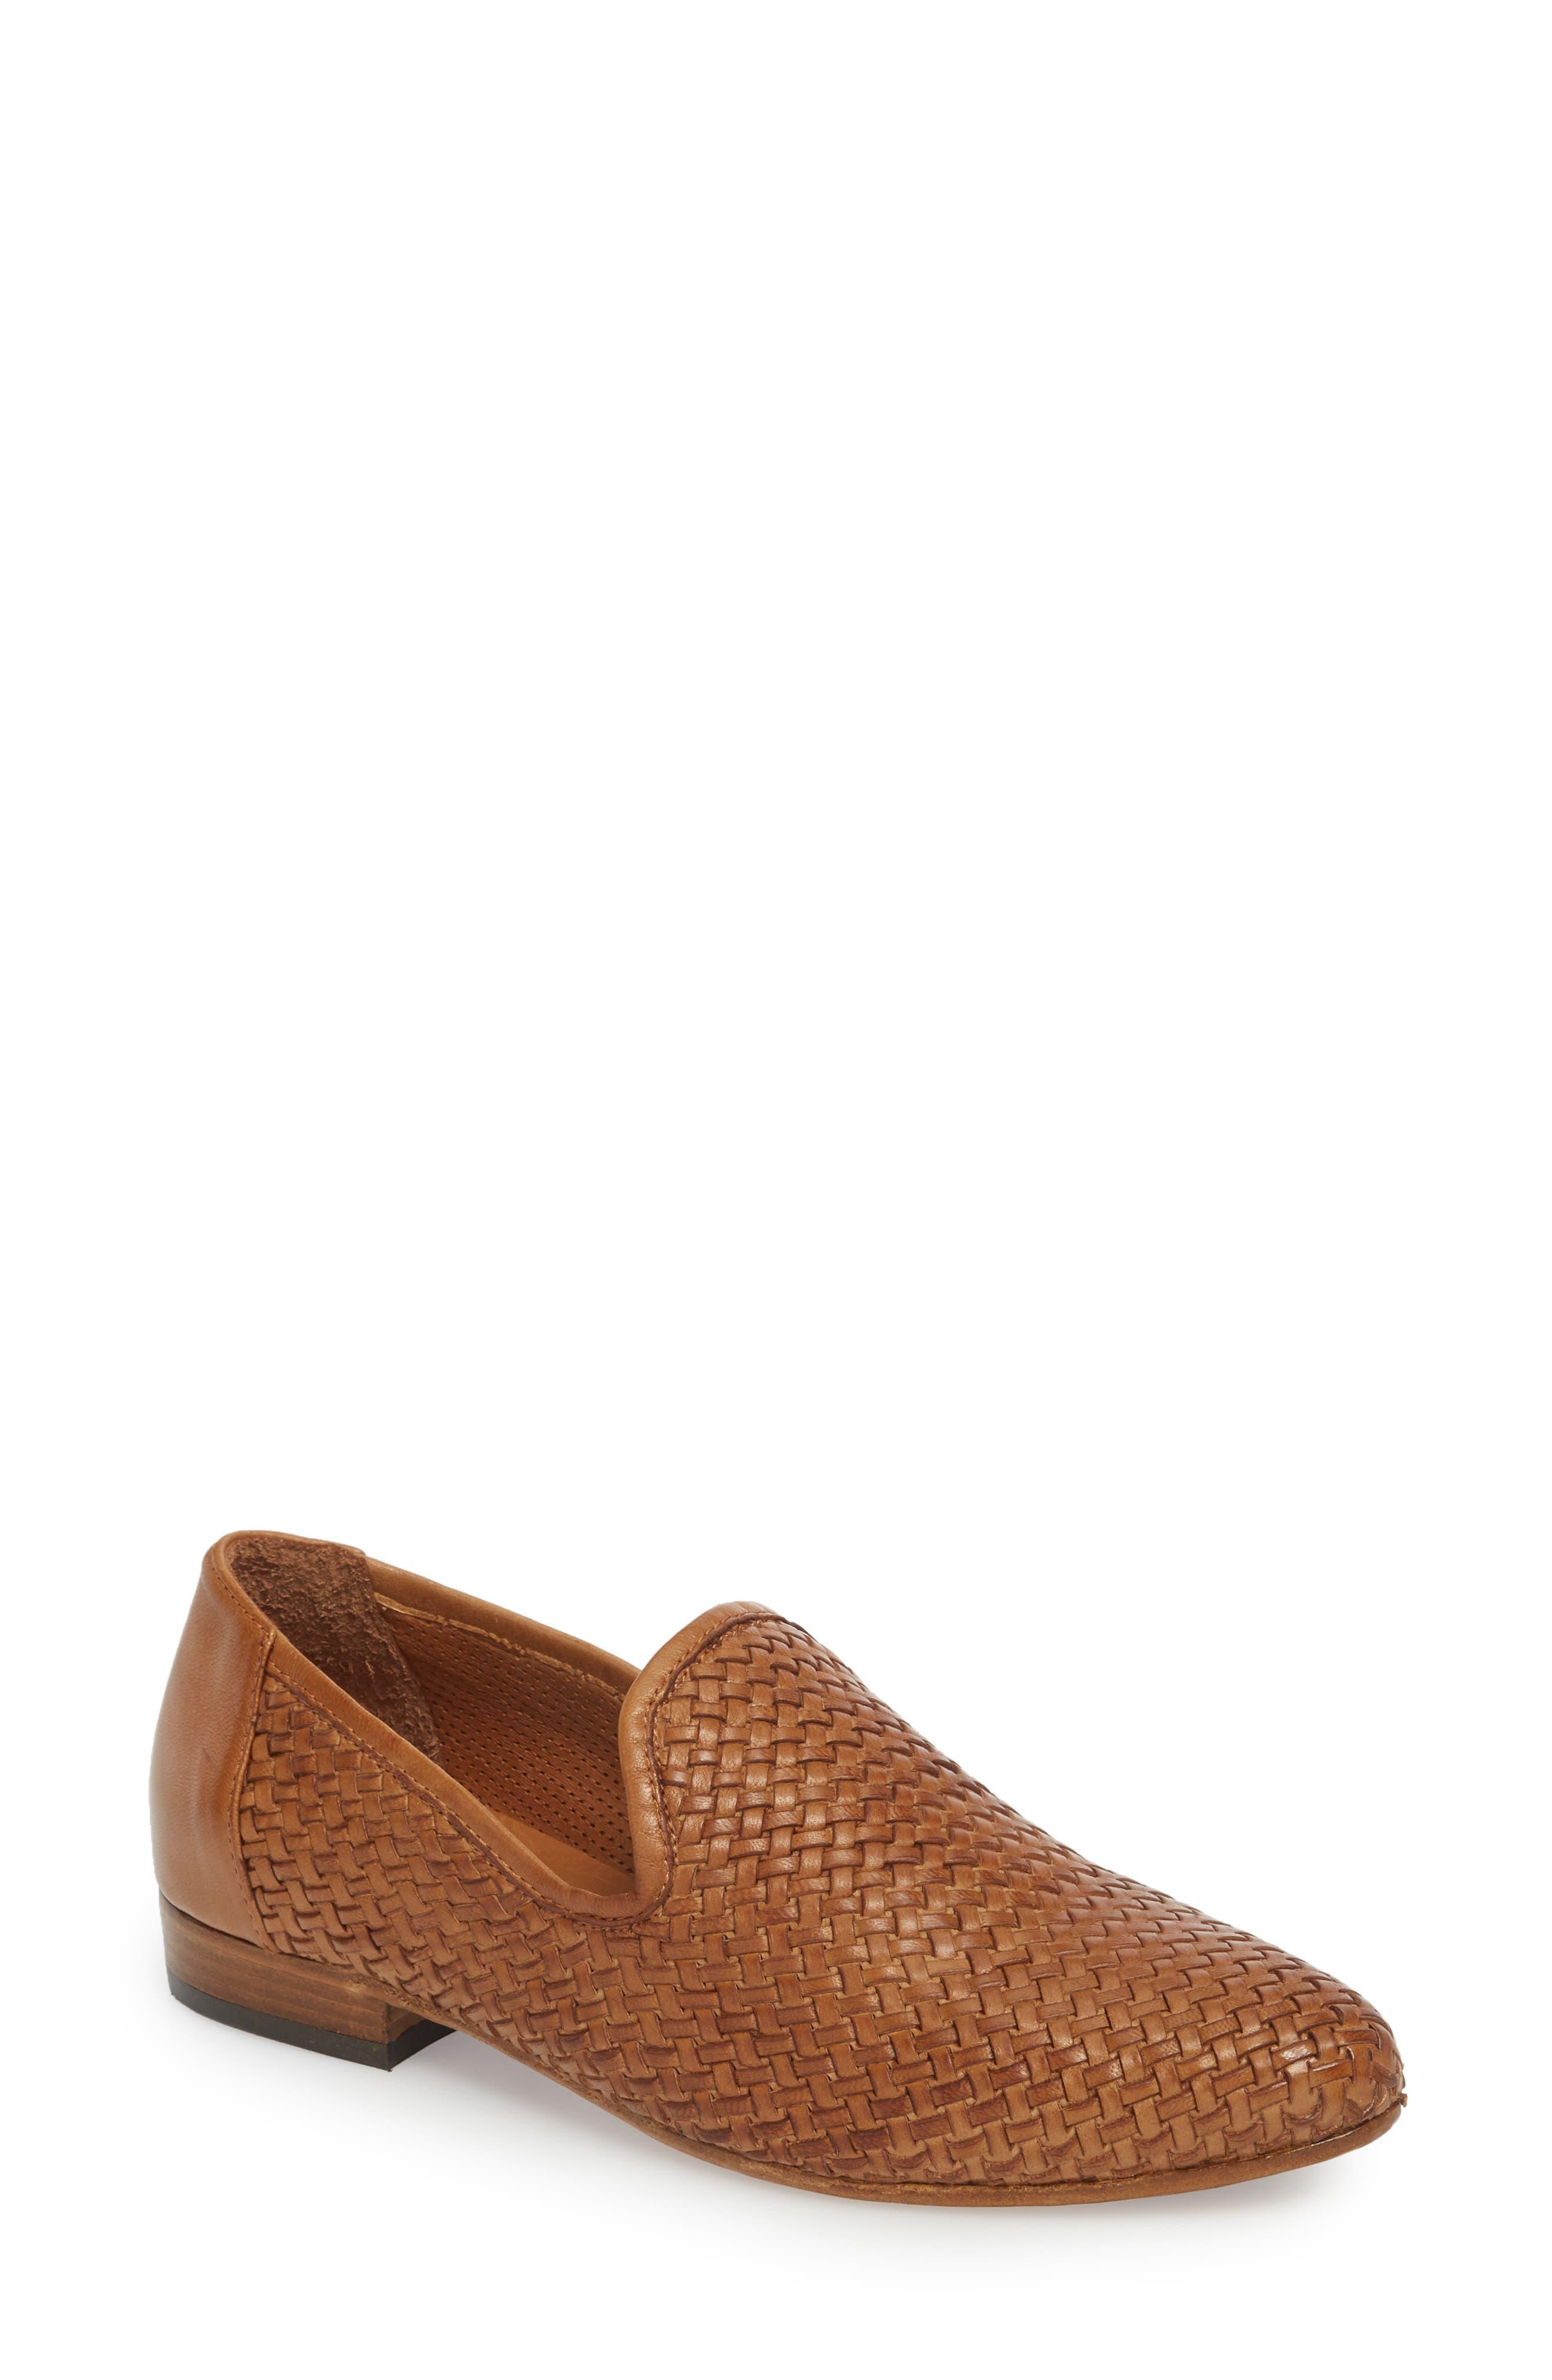 Image of RON WHITE Yara Woven Slip-On Loafer